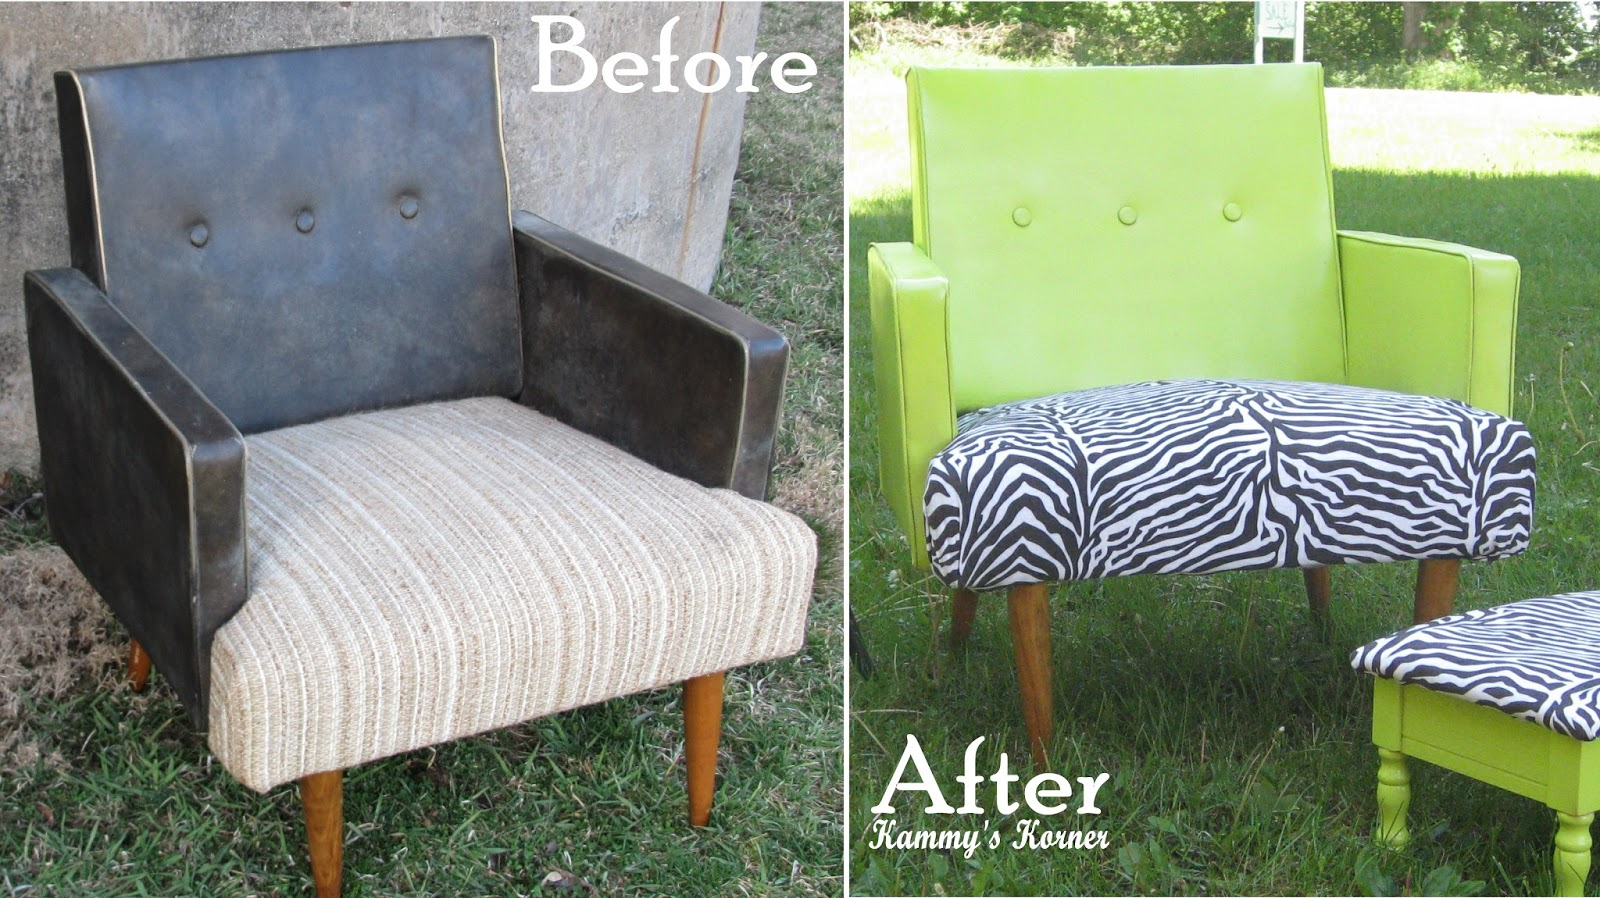 Superb Spray Painted Vinyl Zebra Chair